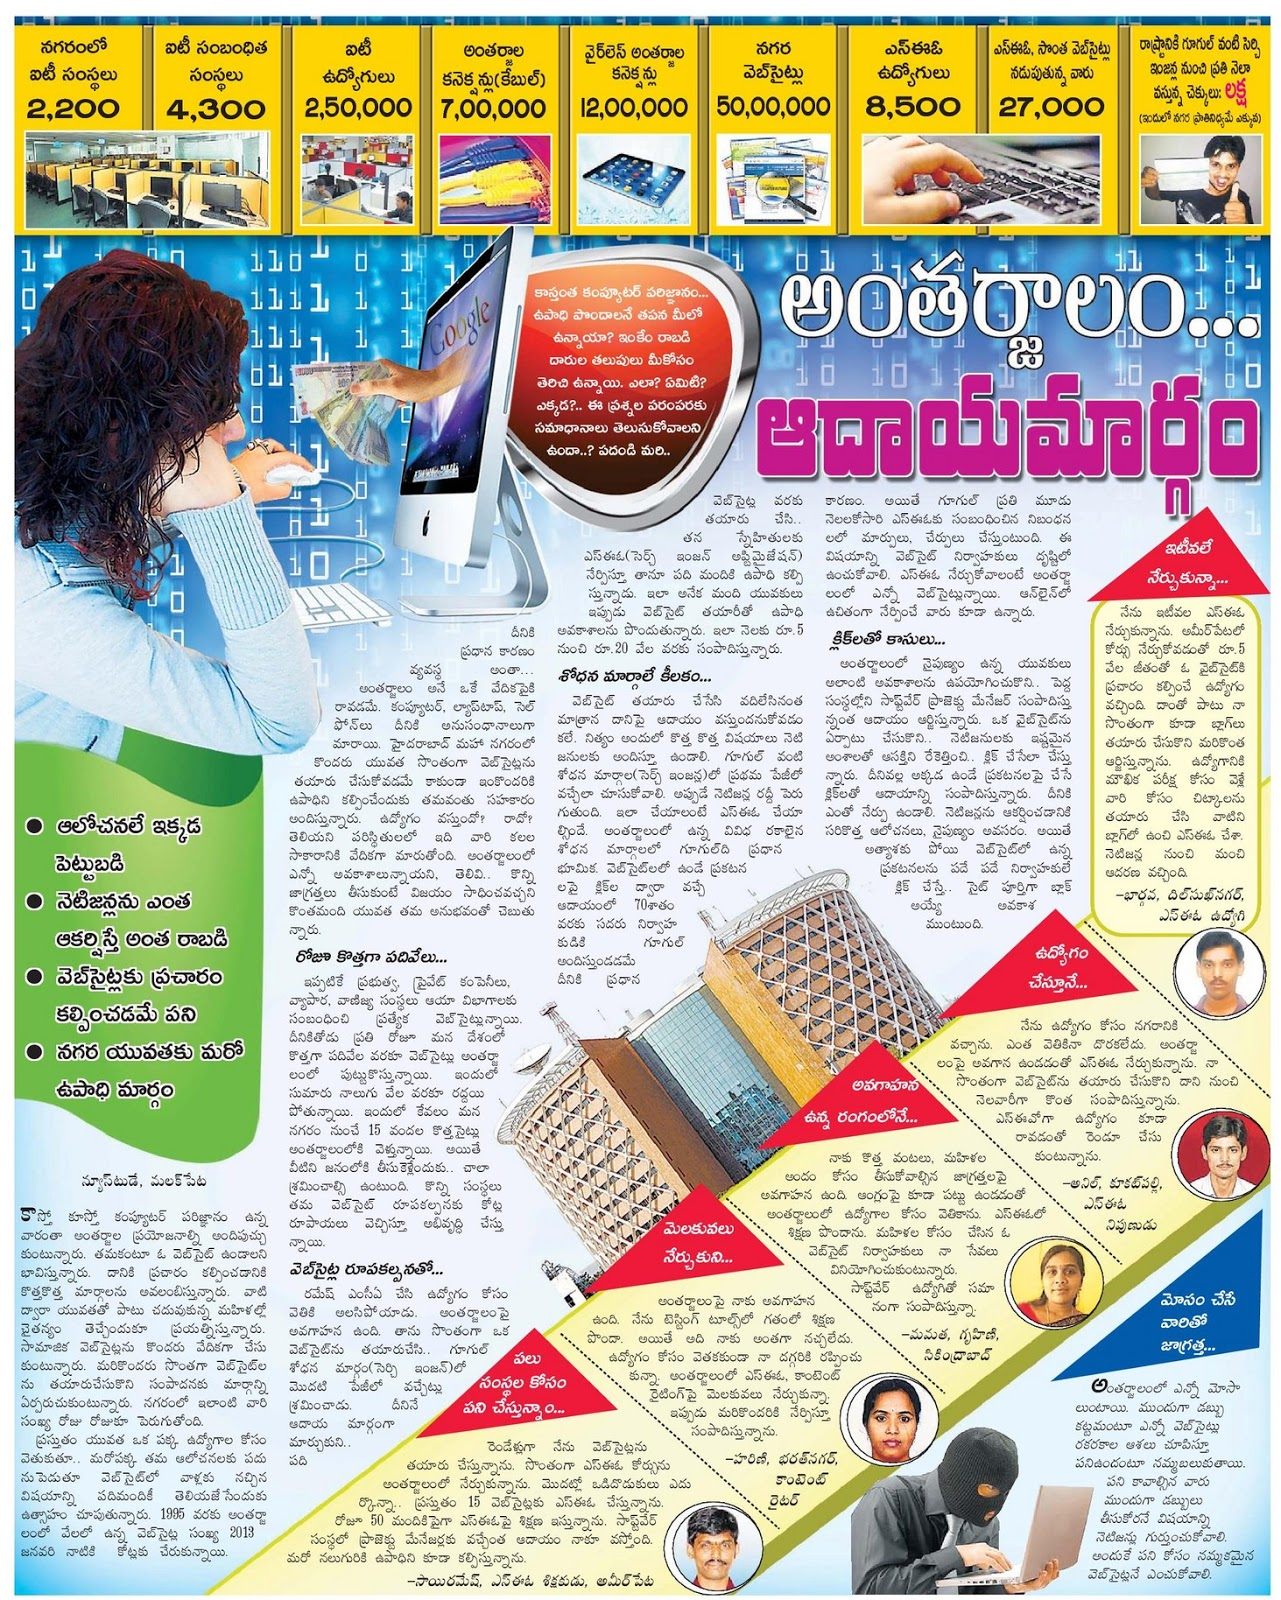 Seo freelancer in hyderabad eenadu article earn money from internet eenadu article earn money from internet ccuart Gallery